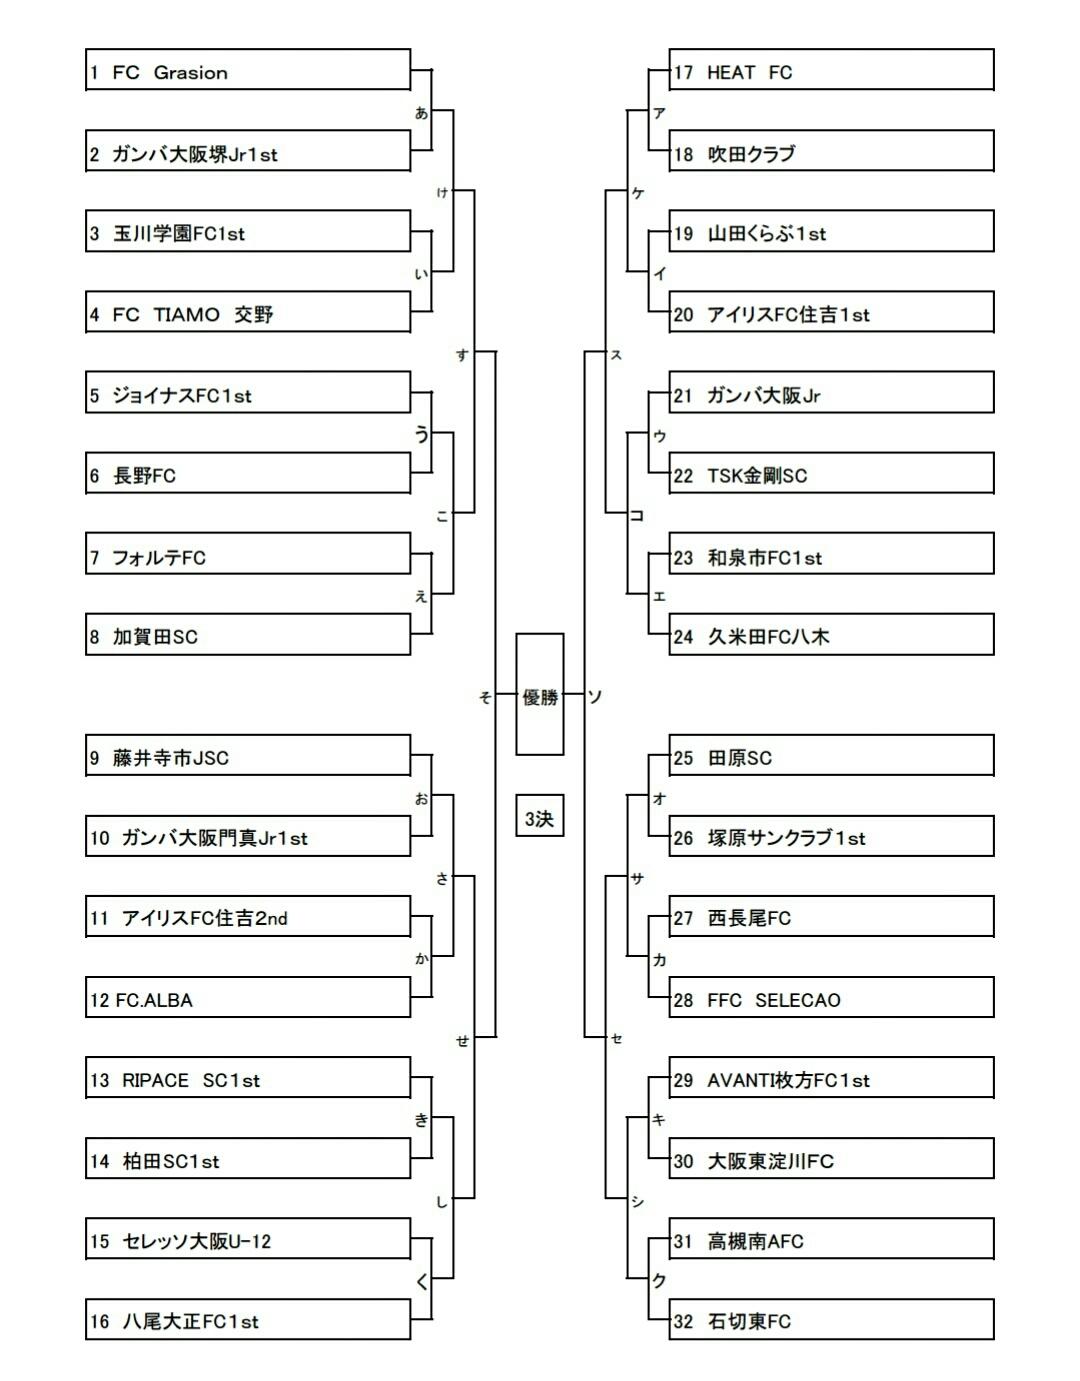 U12   ⚽2016年度 ライフカップ 第40回大阪府少年サッカー選手権大会 中央大会 (7/17~24) 組み合わせ決定‼_f0138335_01434169.jpg